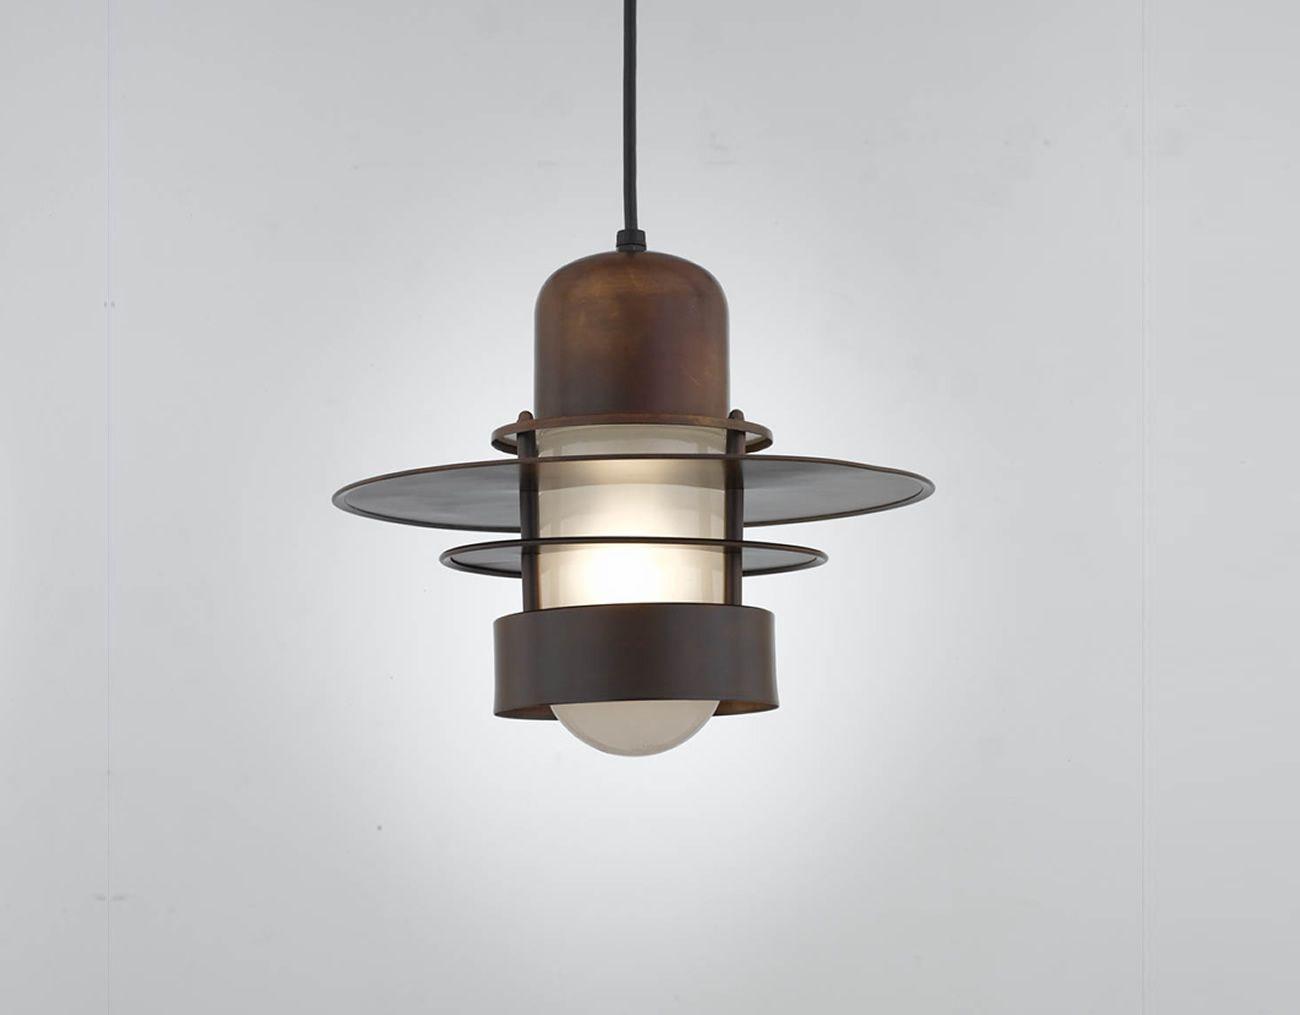 Saturn Shade By Hi Lite Mfg Co Lighting Barn Lighting Industrial Lighting